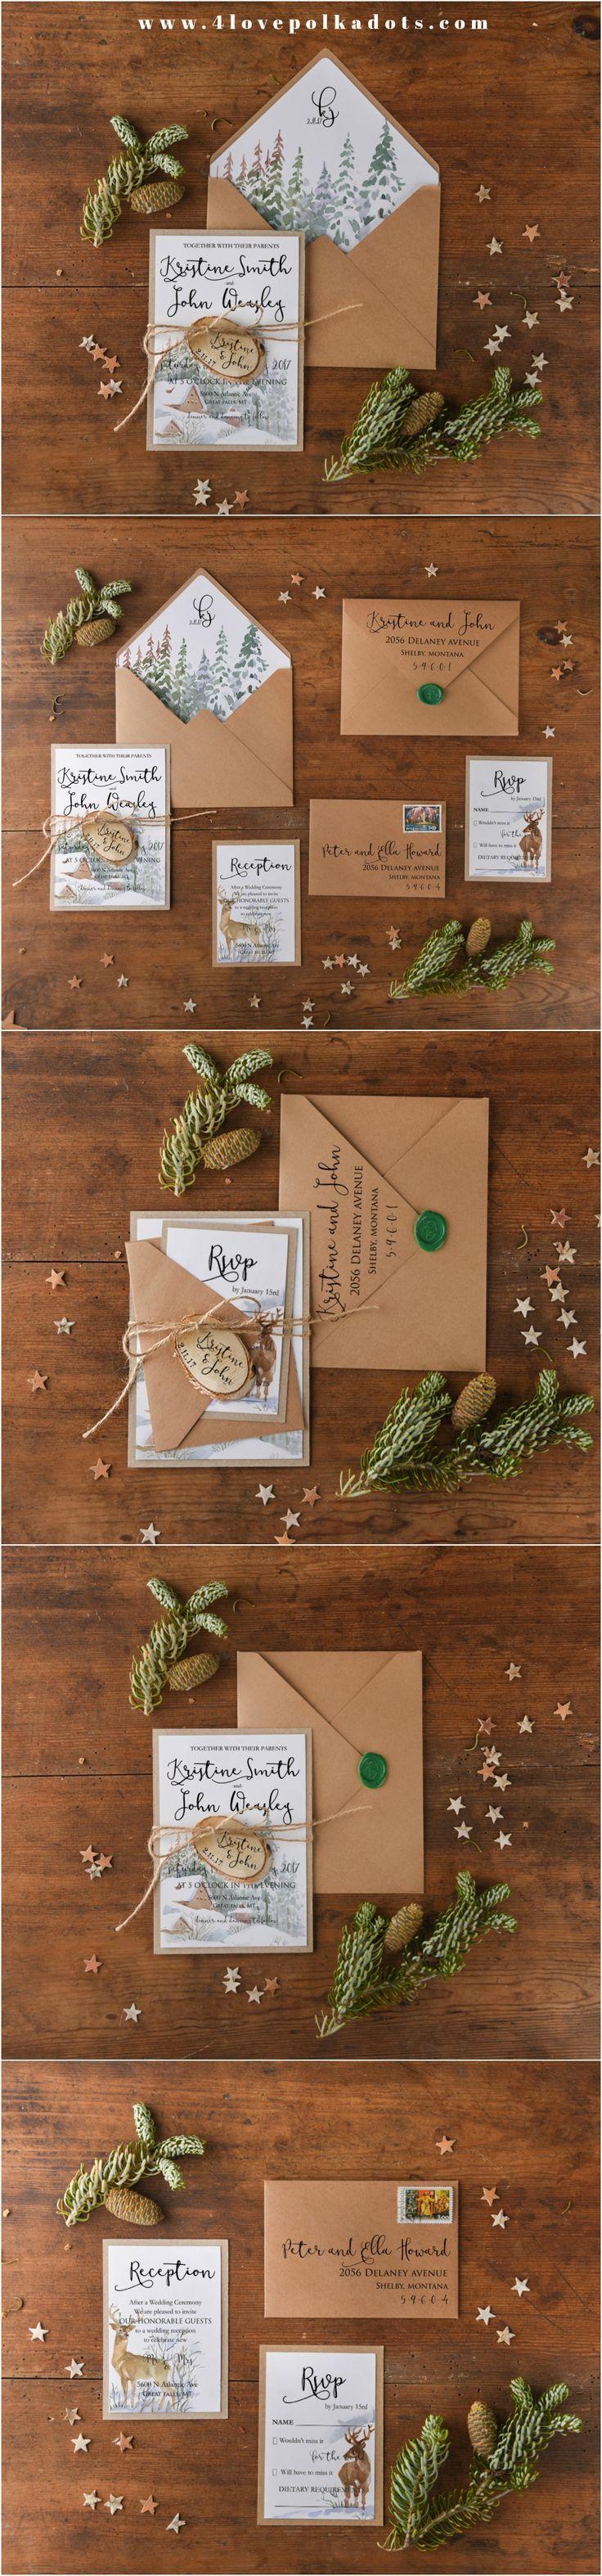 Invitation Inspiration: Rustic Kraft Paper Winter Wedding Invitations with Wooden Tag #rebeccaingramcontest #figiairways #yasawaislandresort